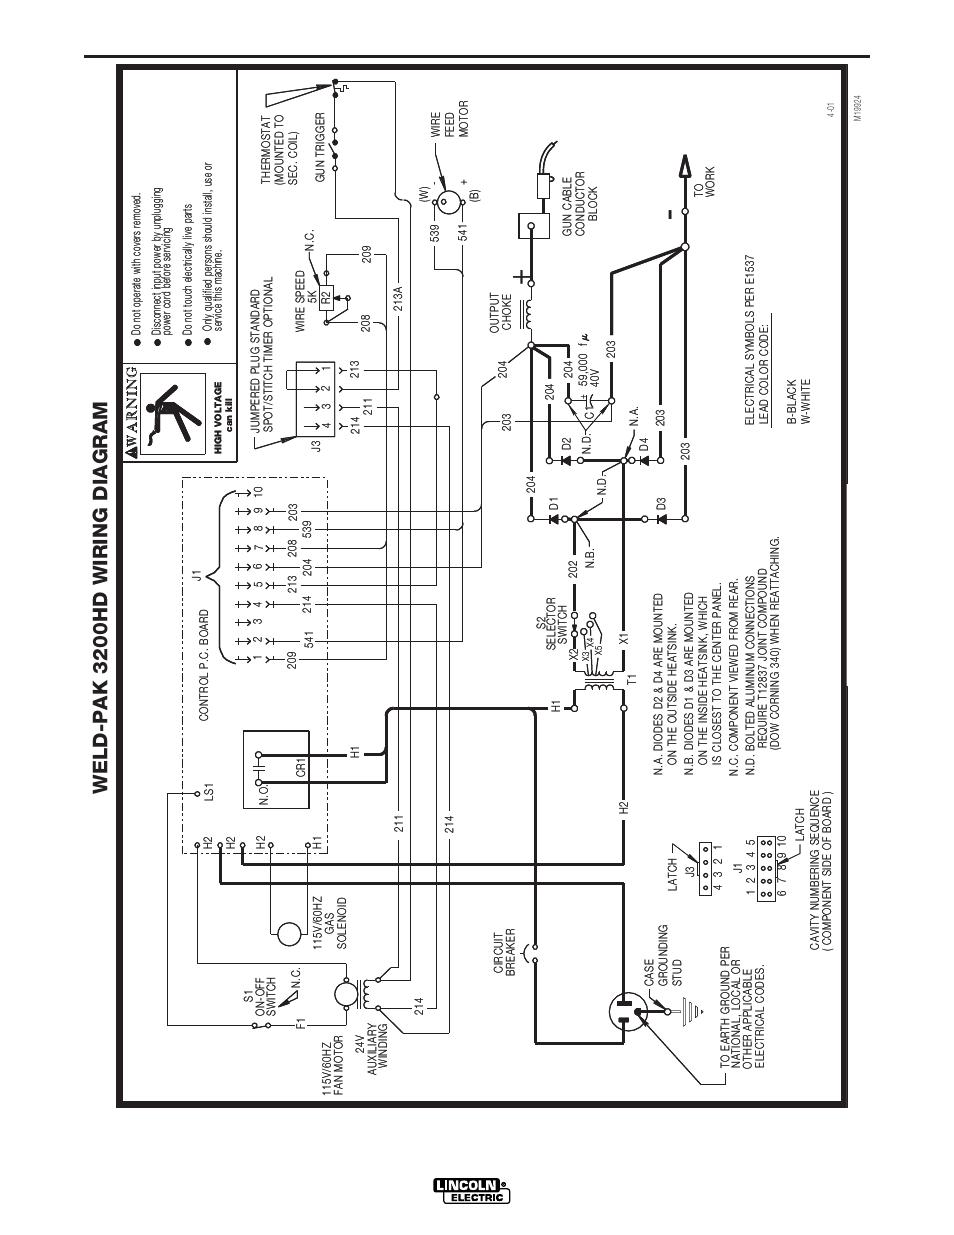 Captivating Hobart Welder Wiring Diagram Gallery Diagram symbol – Lincoln Motor Wiring Diagrams